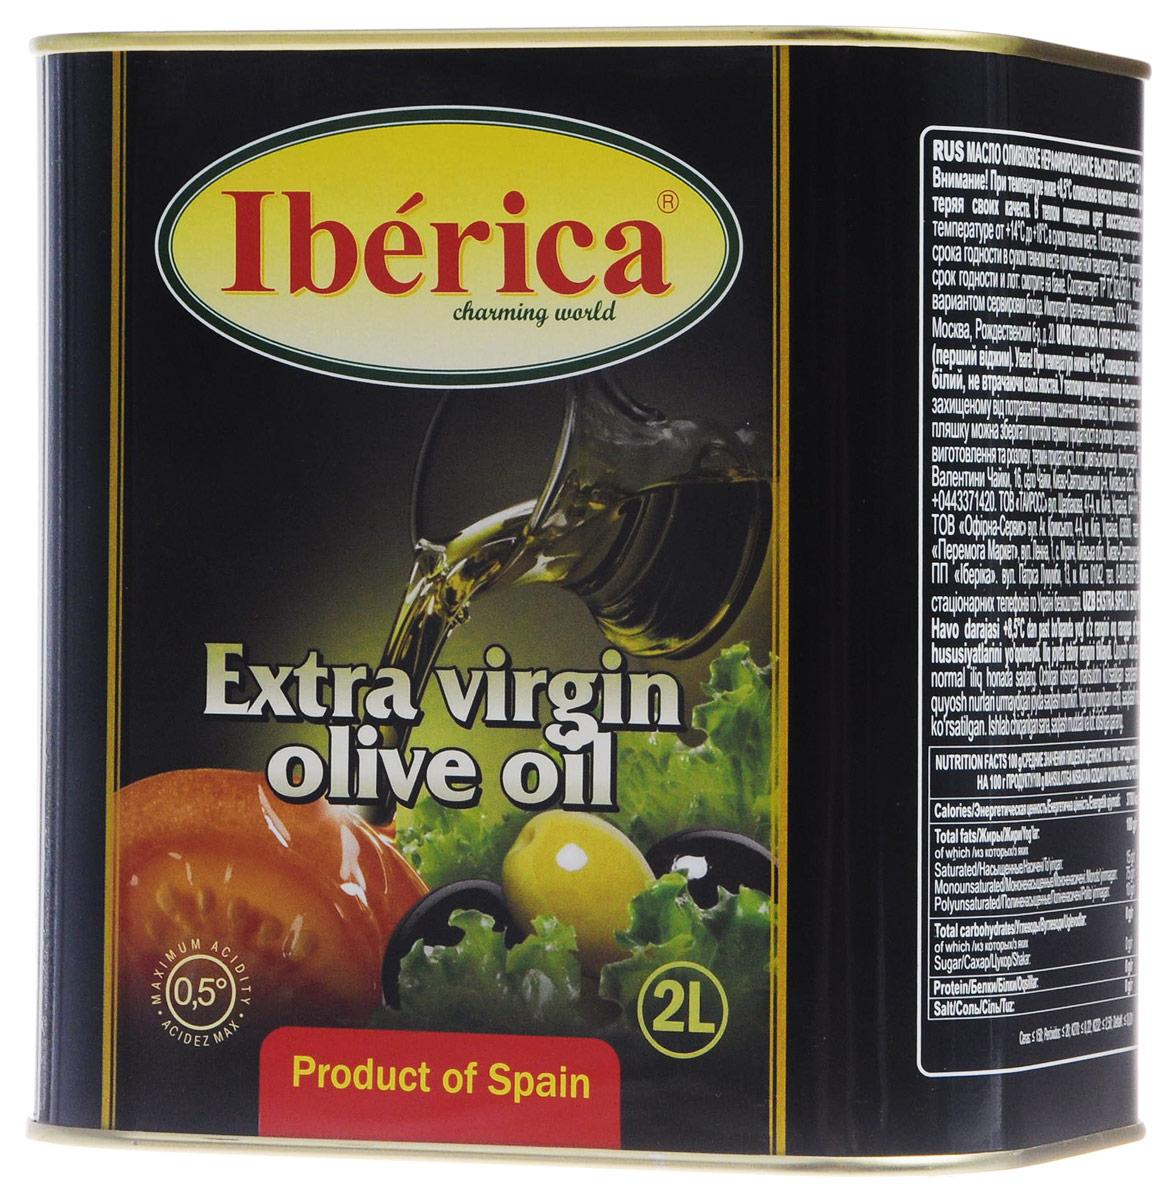 Iberica Extra Virgin масло оливковое, 2 л